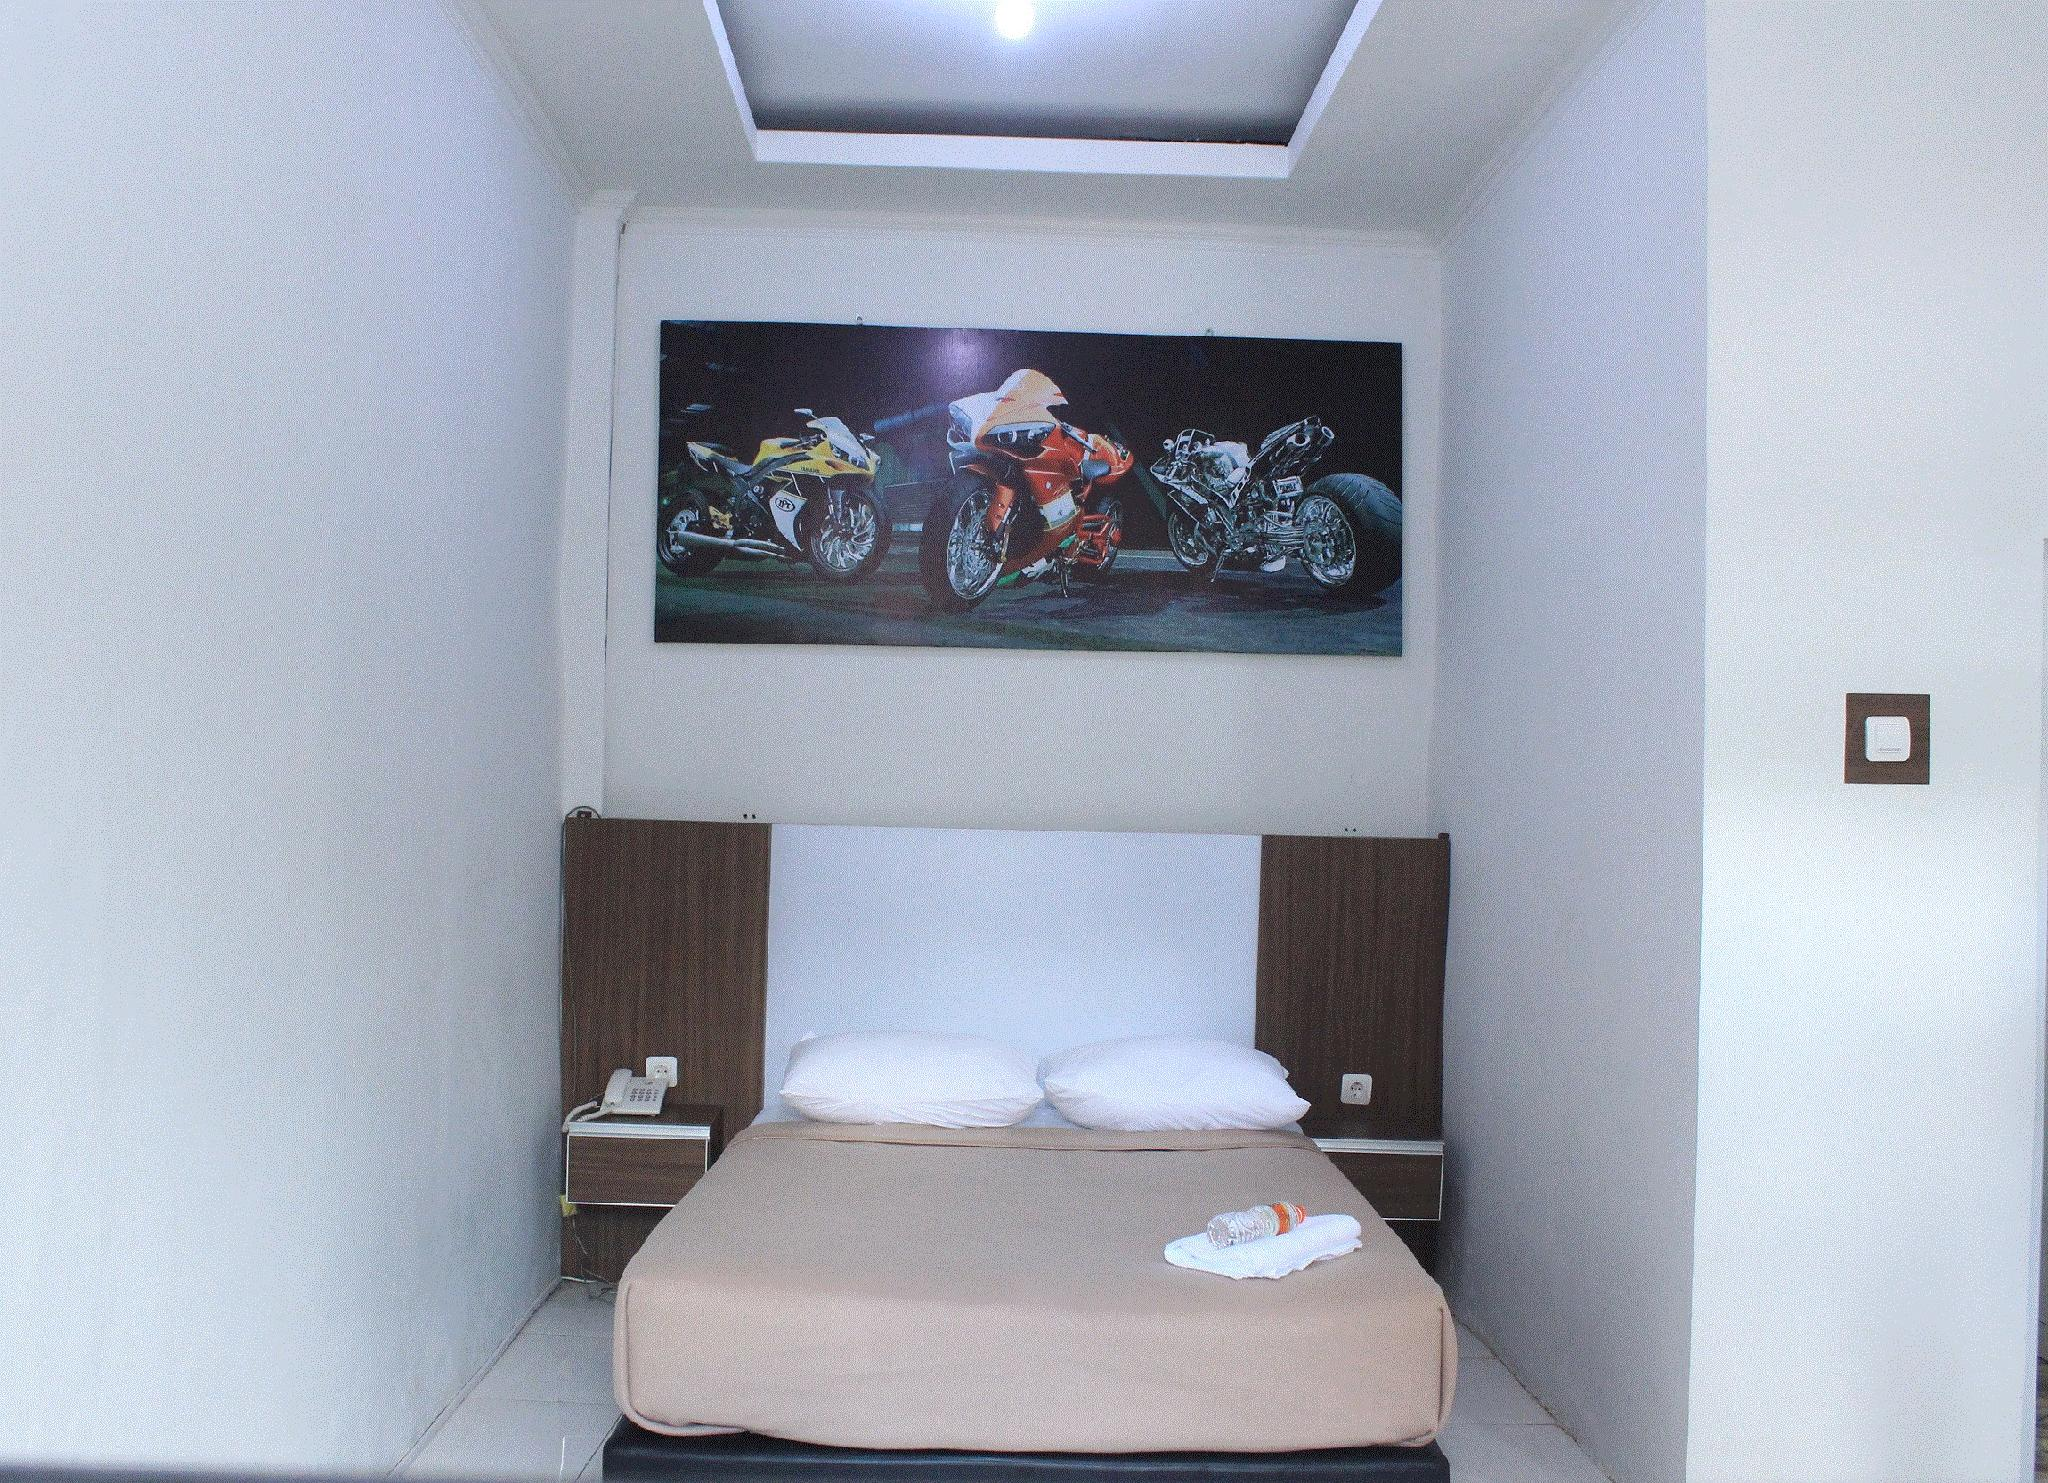 Shanrilla Hotel Tasikmalaya Offres Speciales Pour Cet Hotel